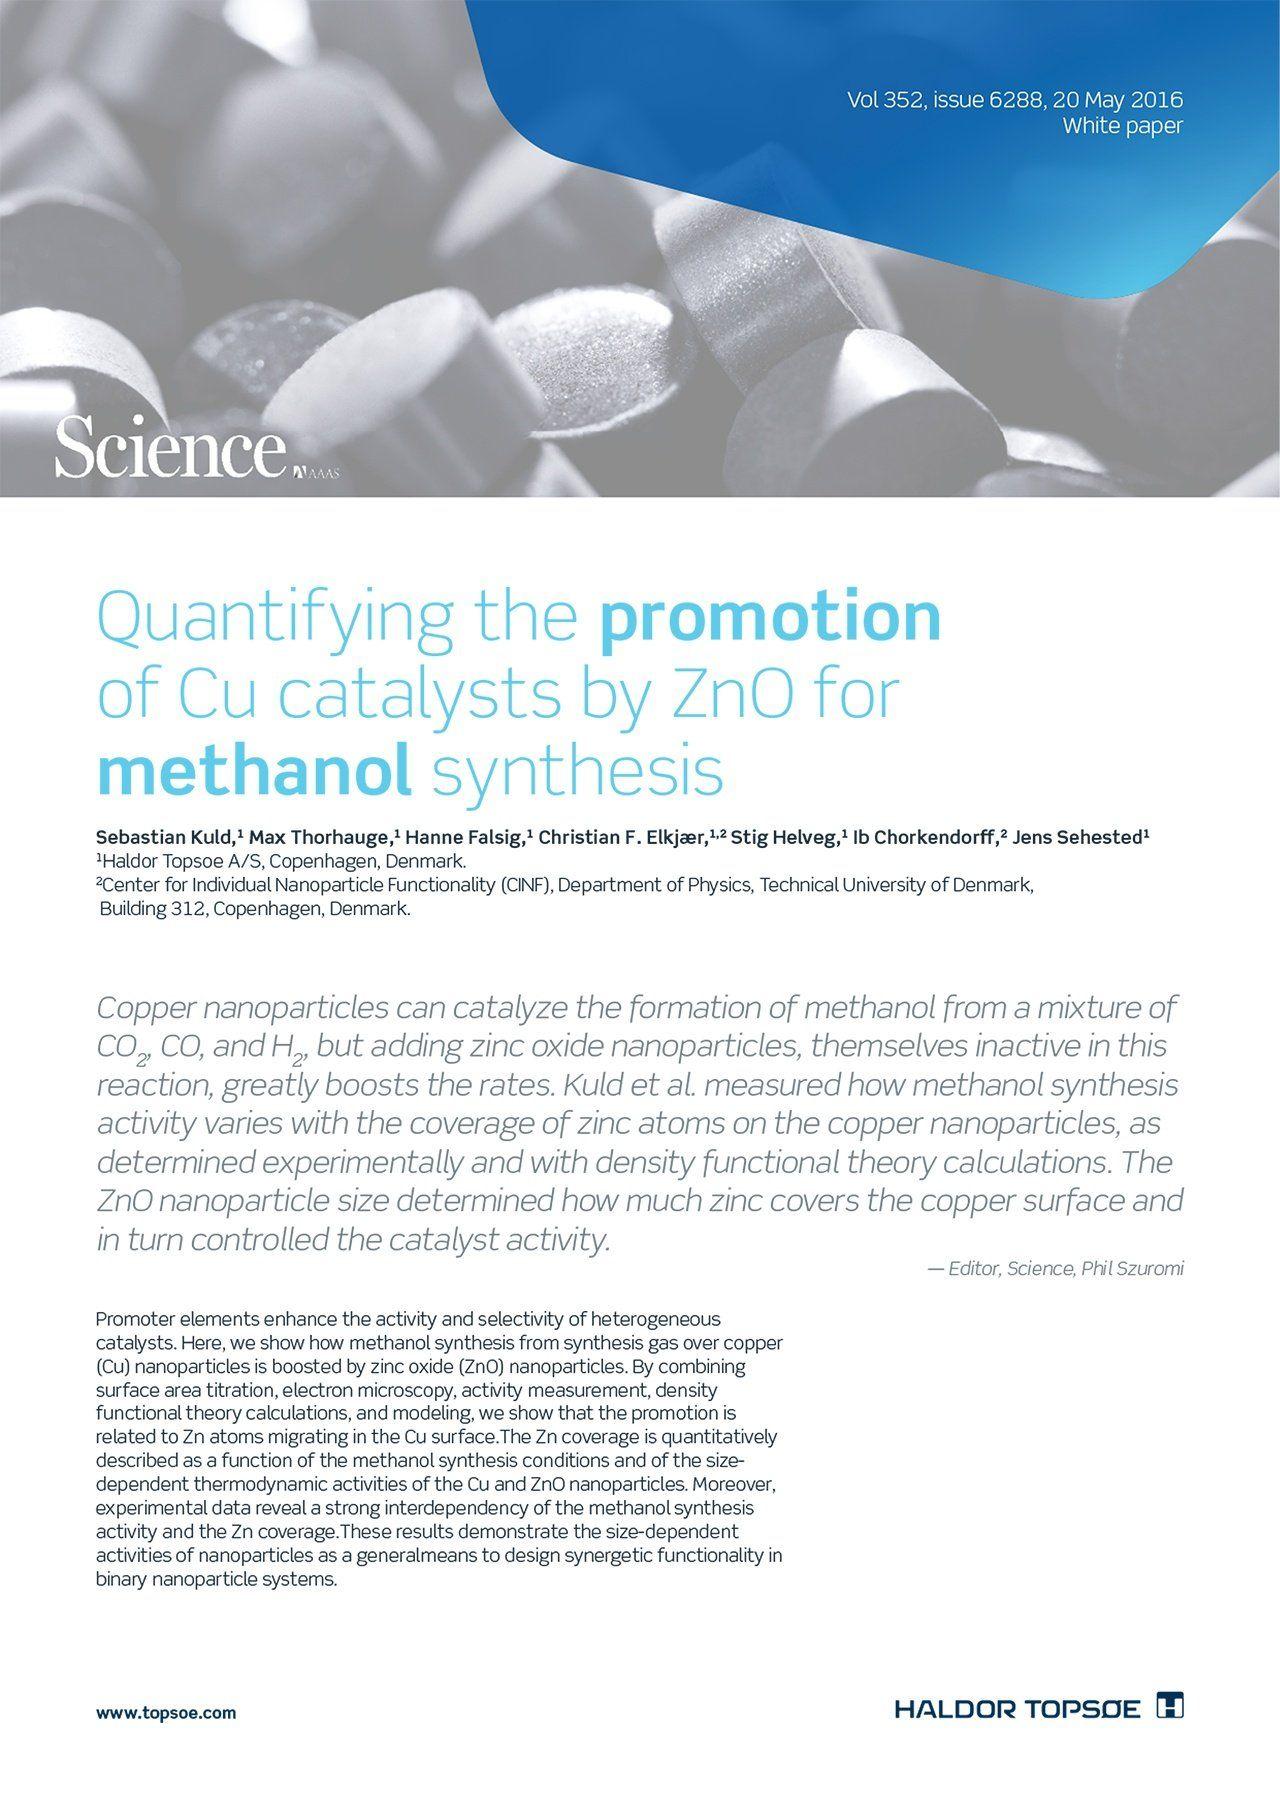 Sebastian-Kuld-Max-Thorhauge-Hanne-Falsig-Christian-F-Elkjær-Stig-Helveg-Ib-Chorkendorff-Jens-Sehested-methanol-synthesis-white-paper